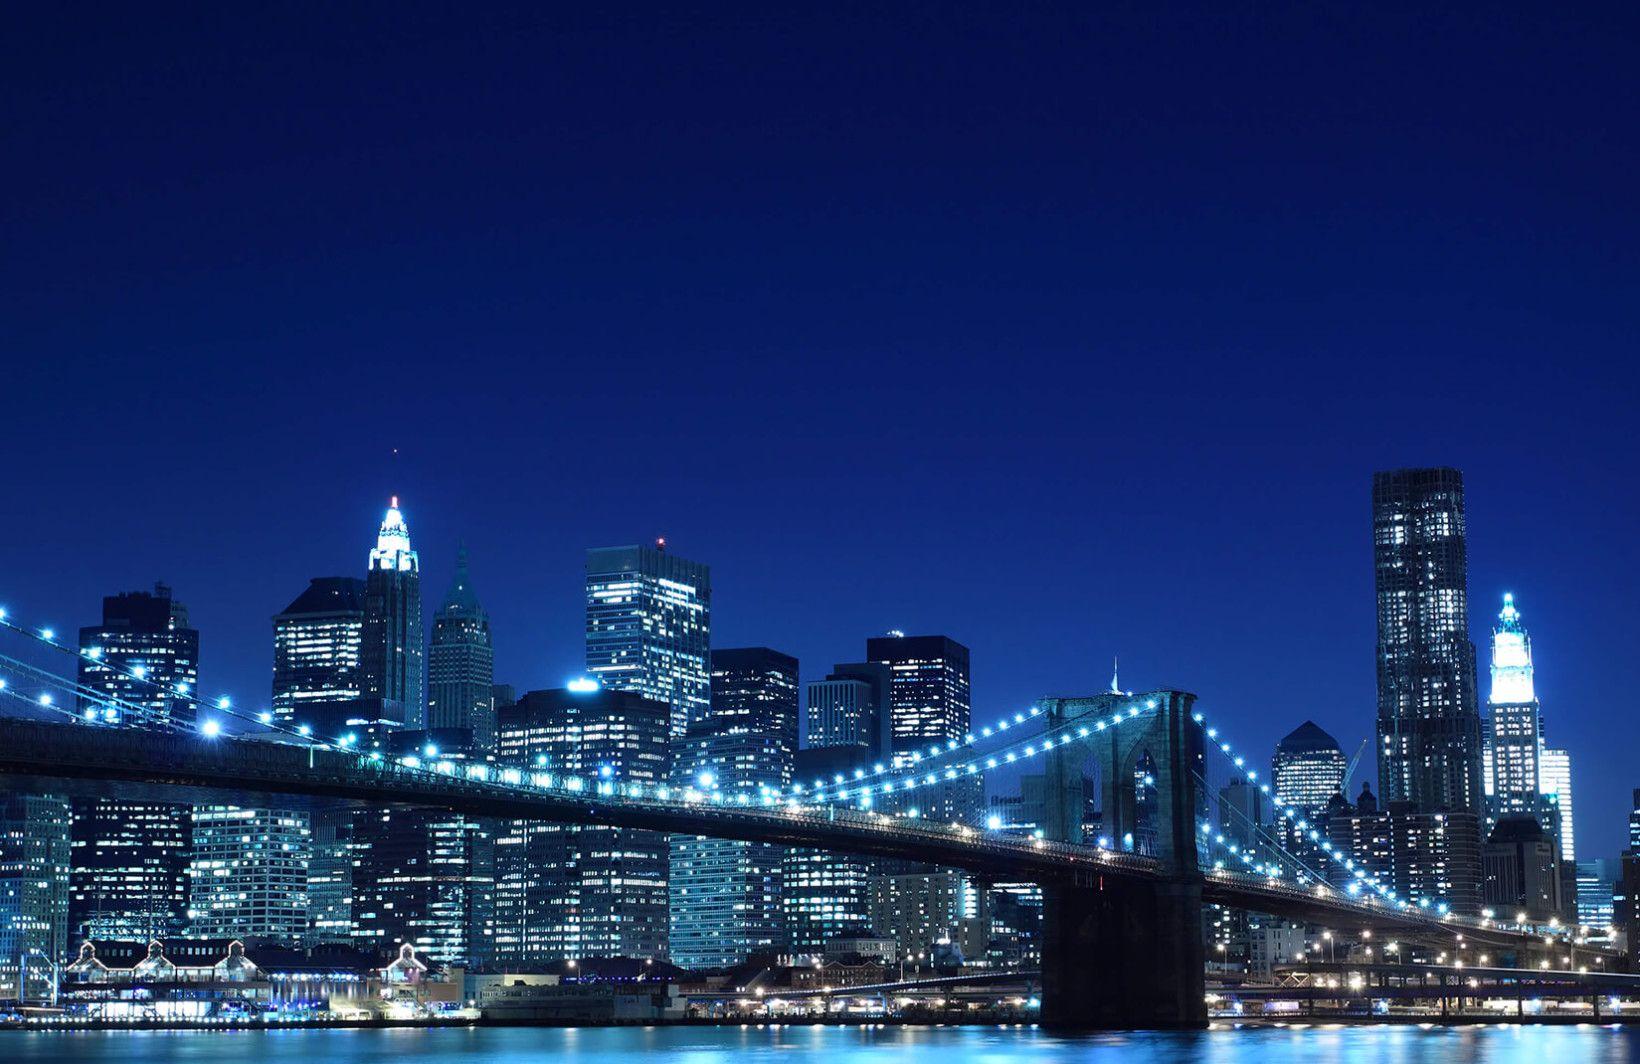 Blue Night Brooklyn Bridge Wallpaper Wall Mural Bridge